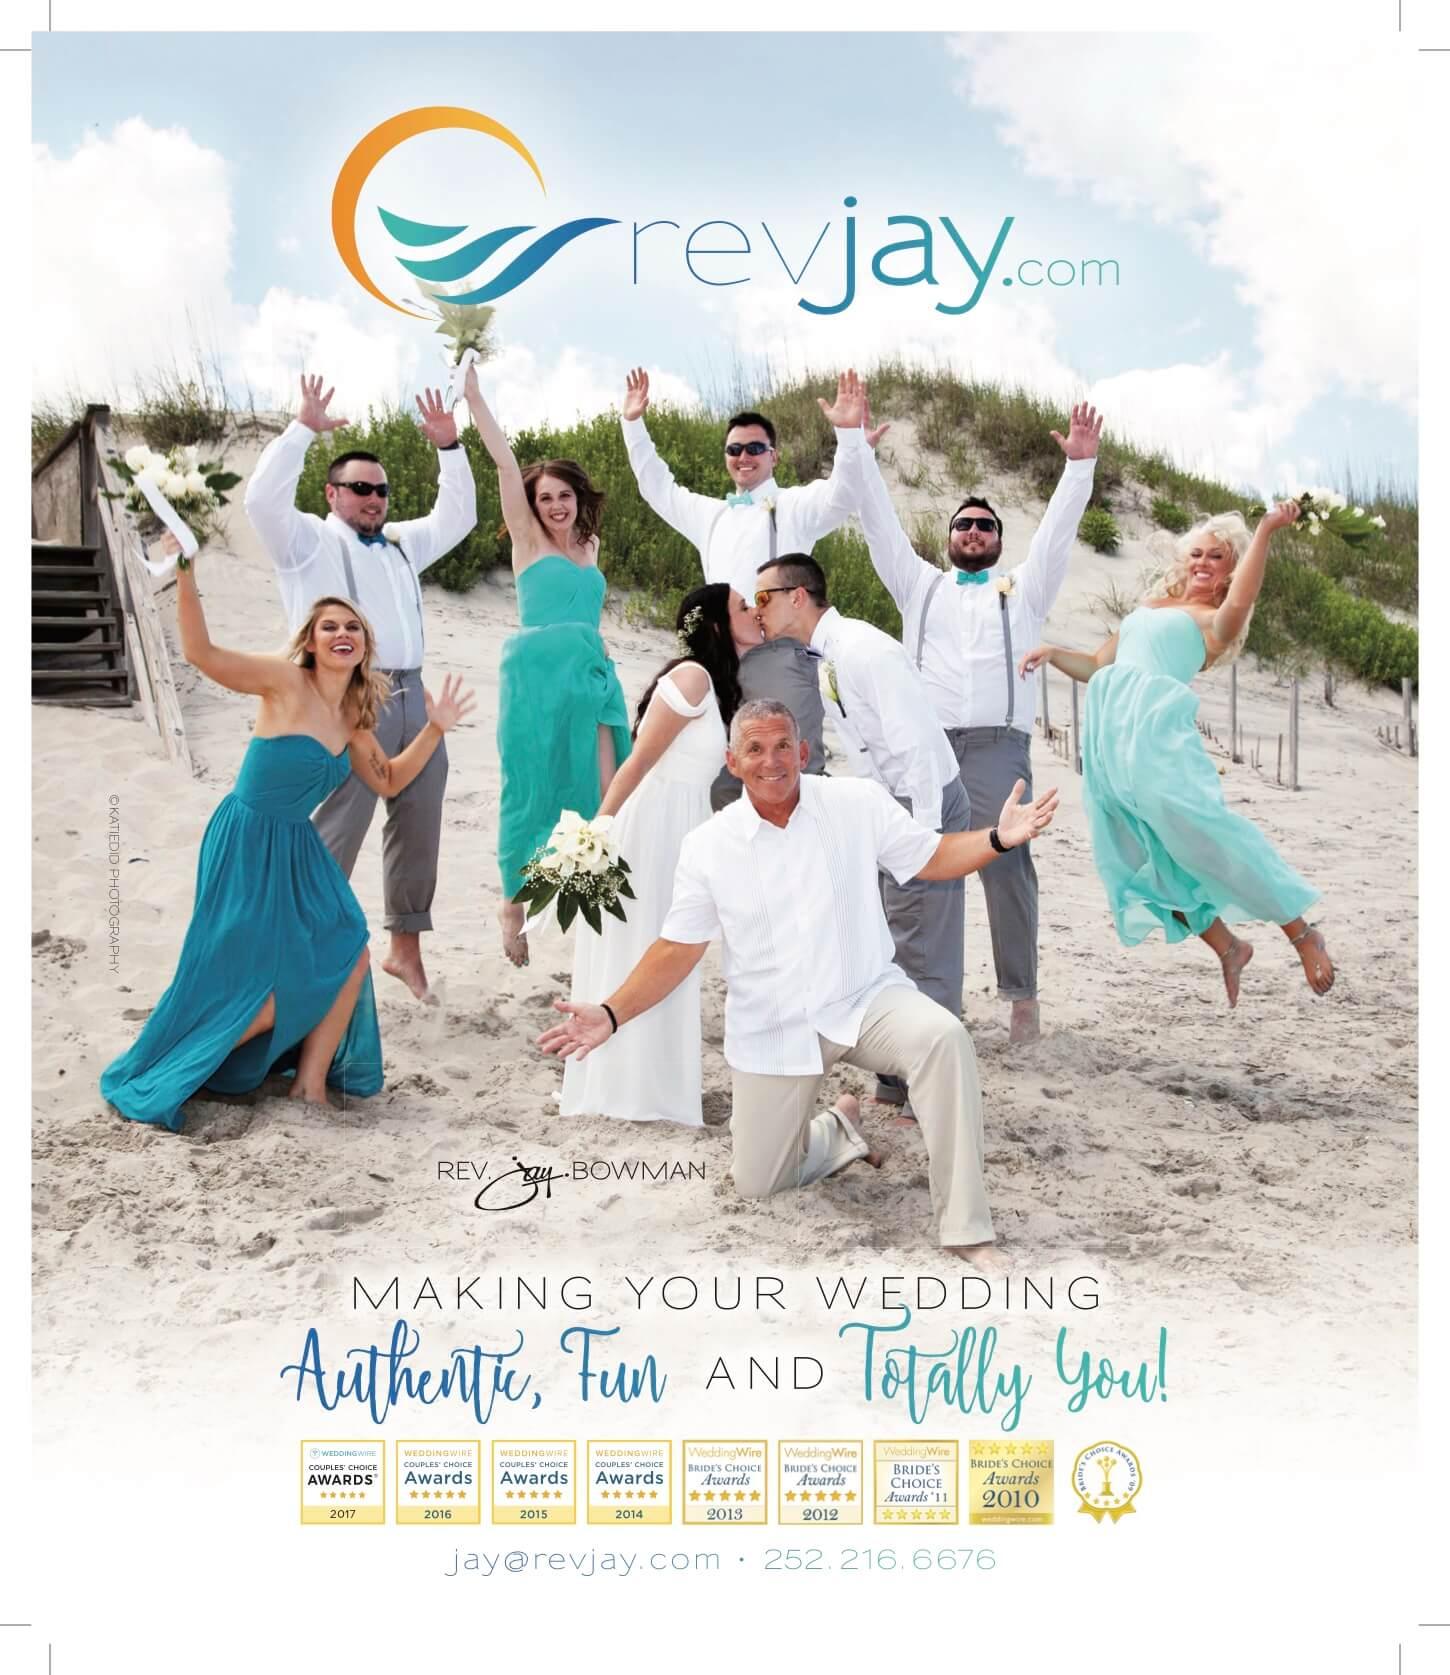 rev.-jay-bowman-obx-wedding-officiant.jpg